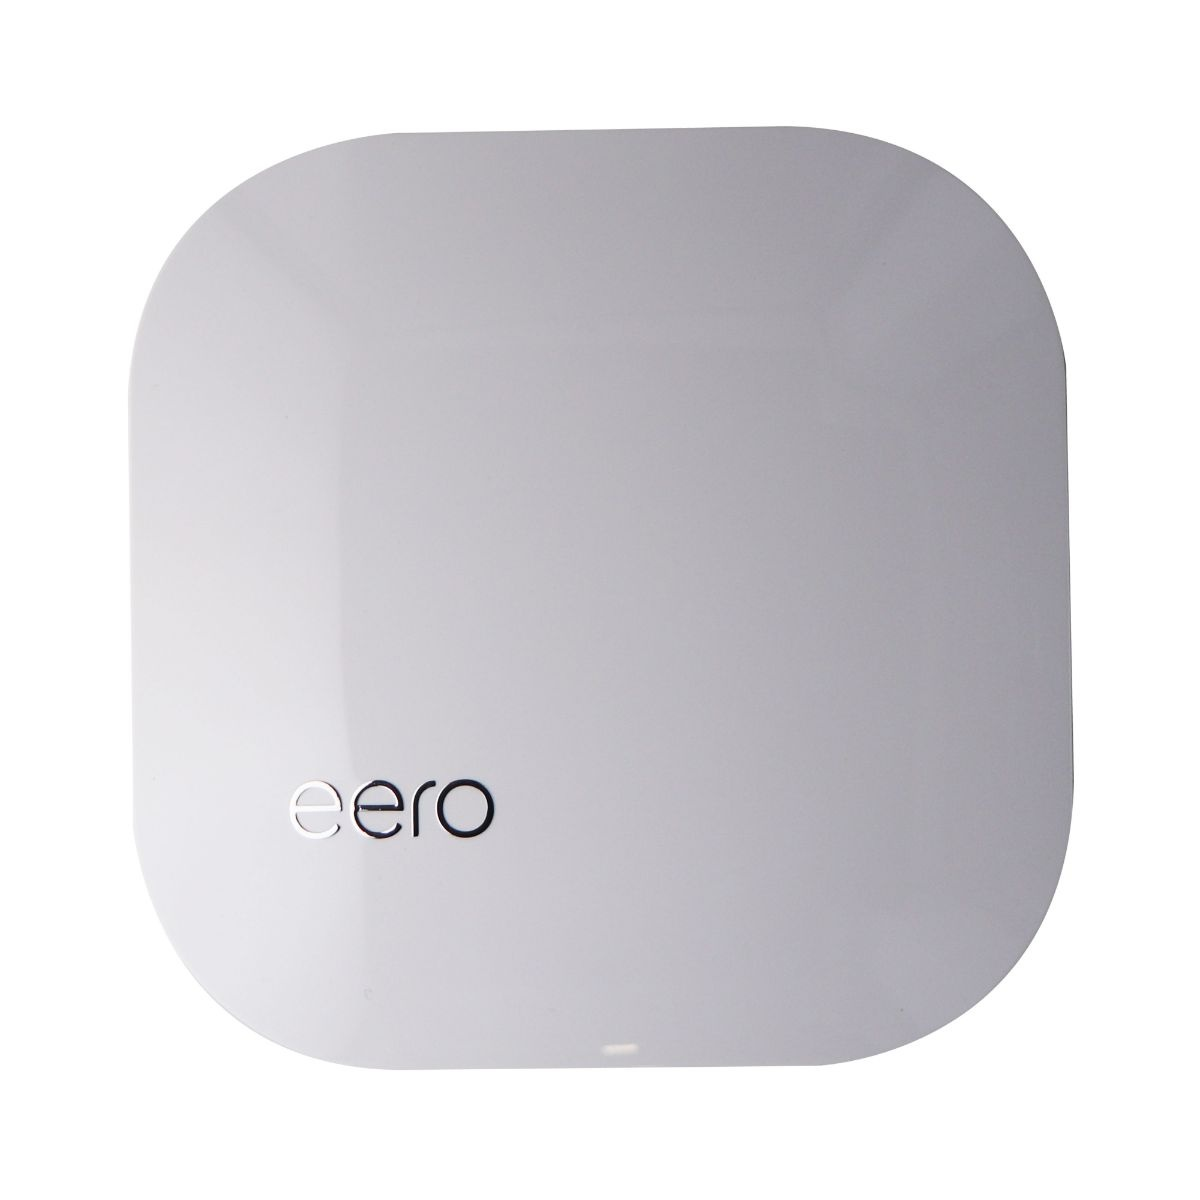 eero Pro Advanced Tri-Band Mesh Wi-Fi System - White (Single)